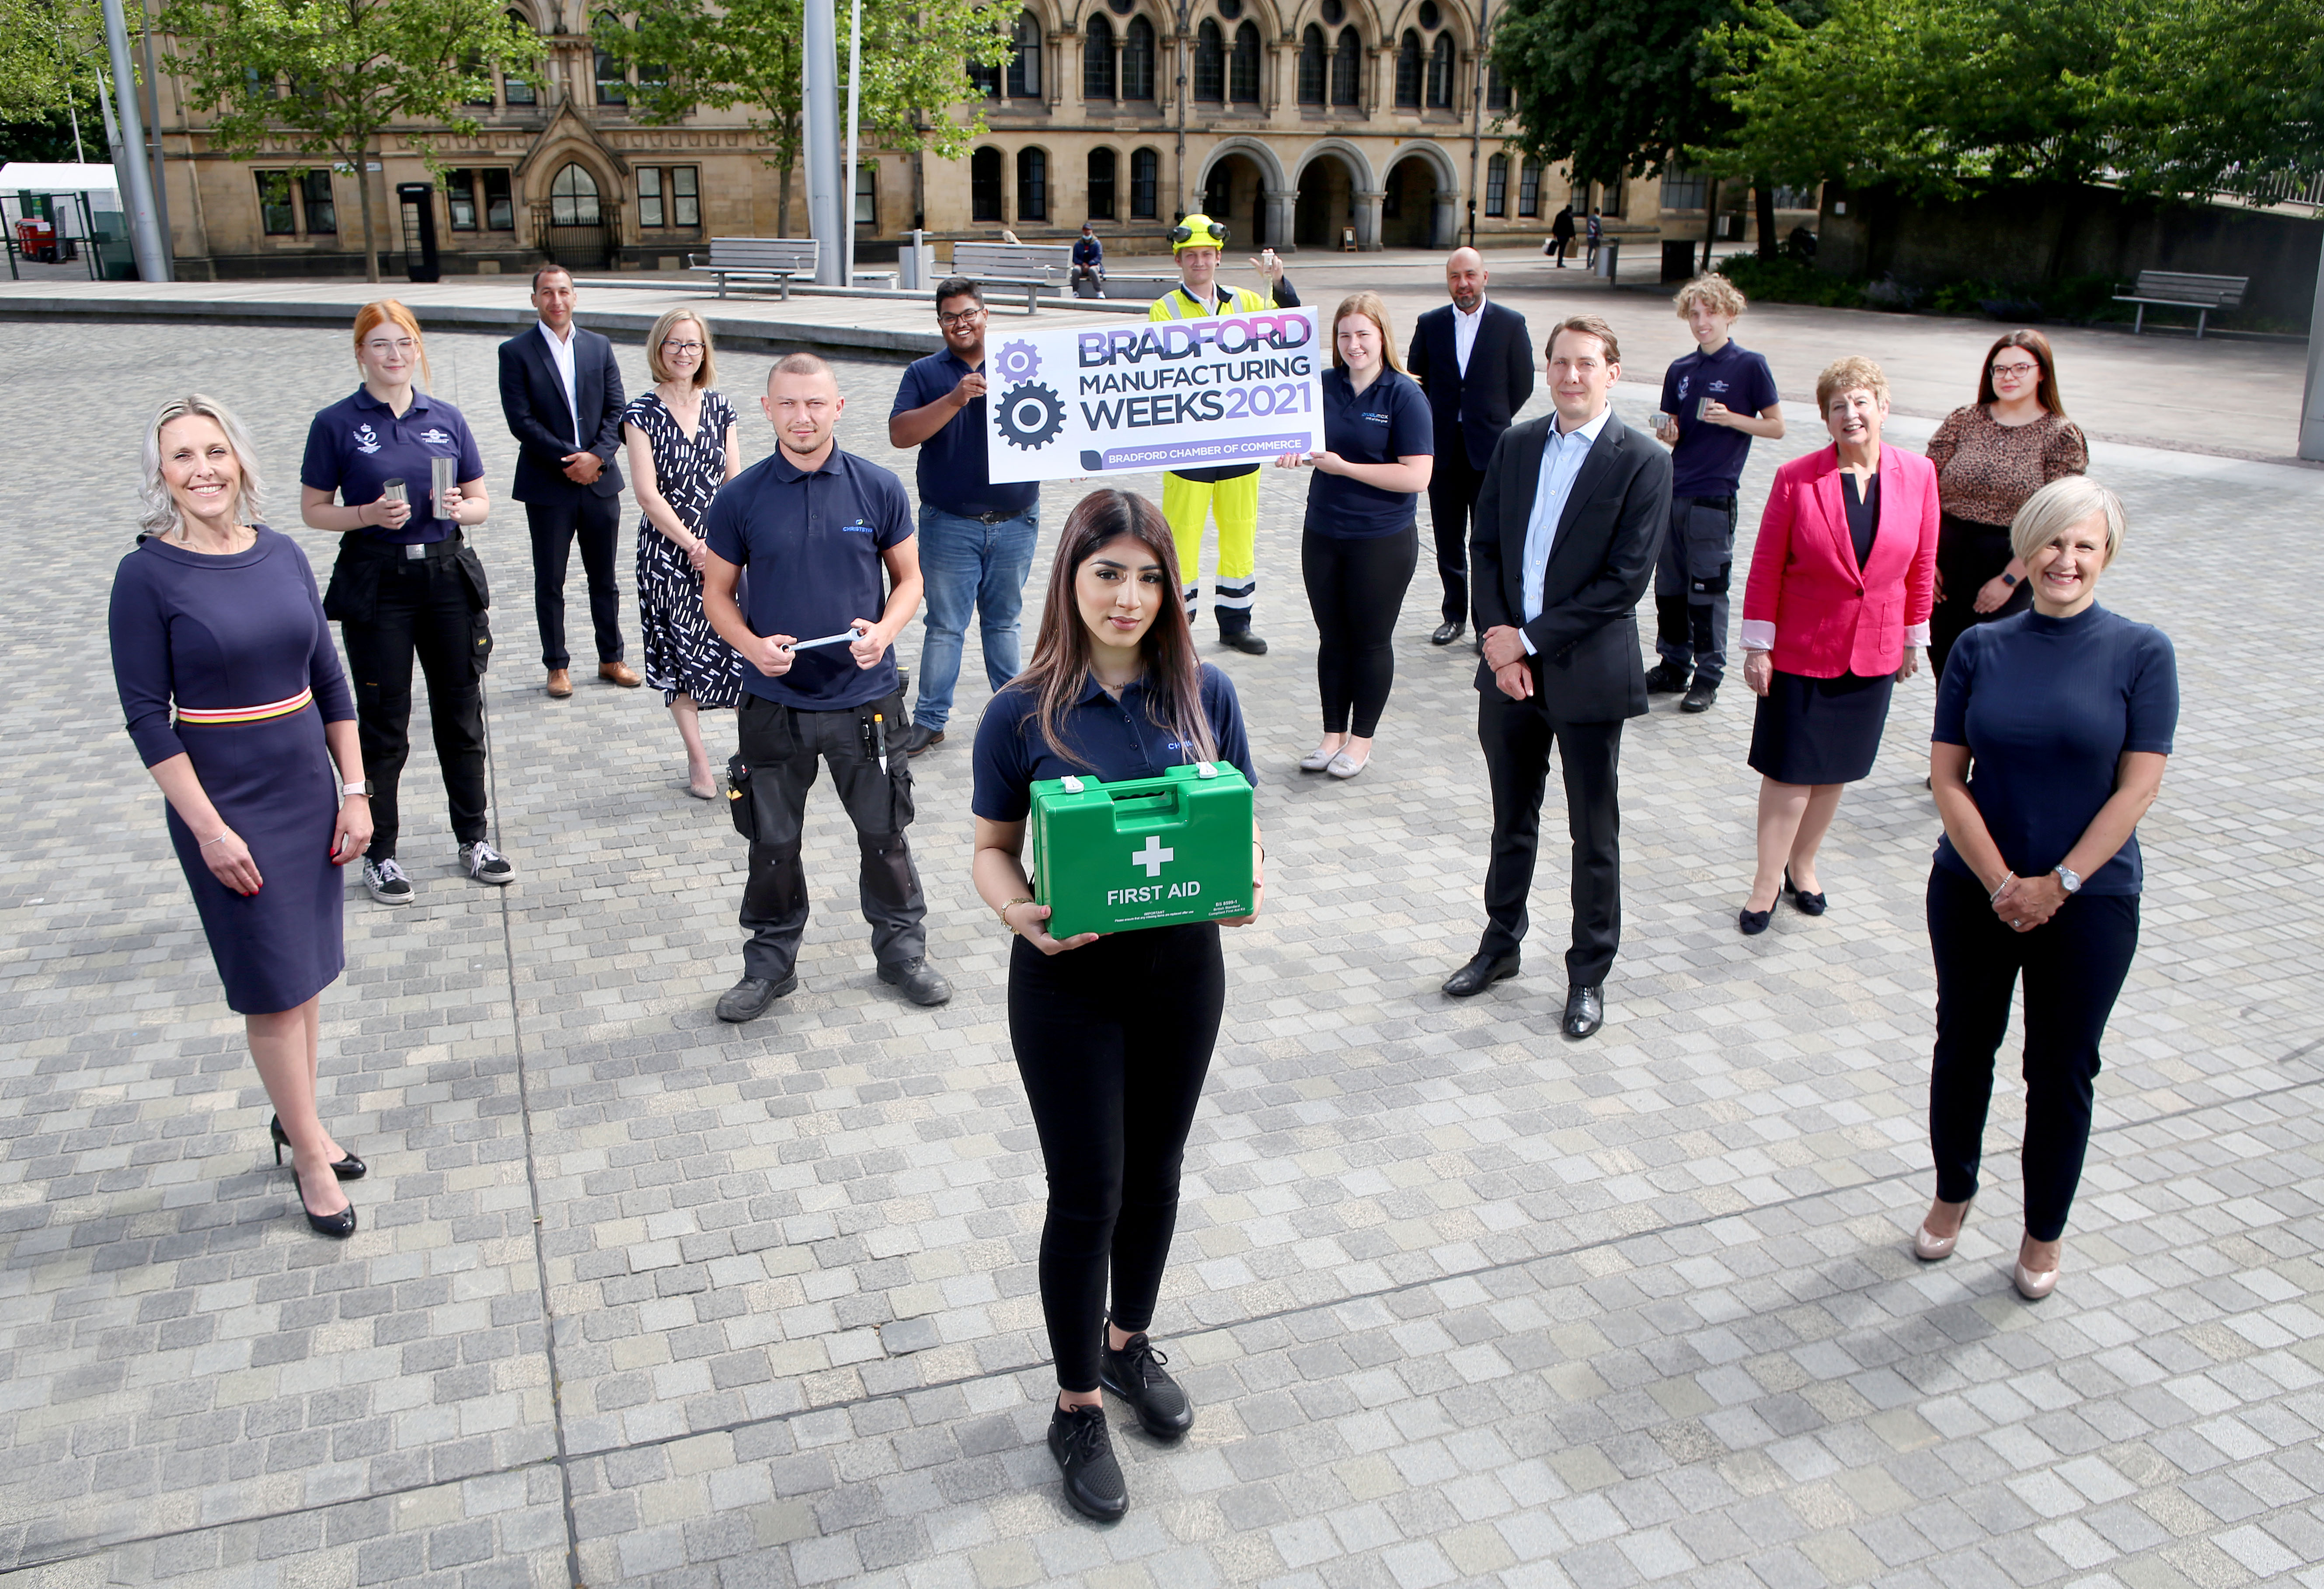 Bradford Manufacturing Weeks 2021 deploys apprentice task force to help inspire pupils